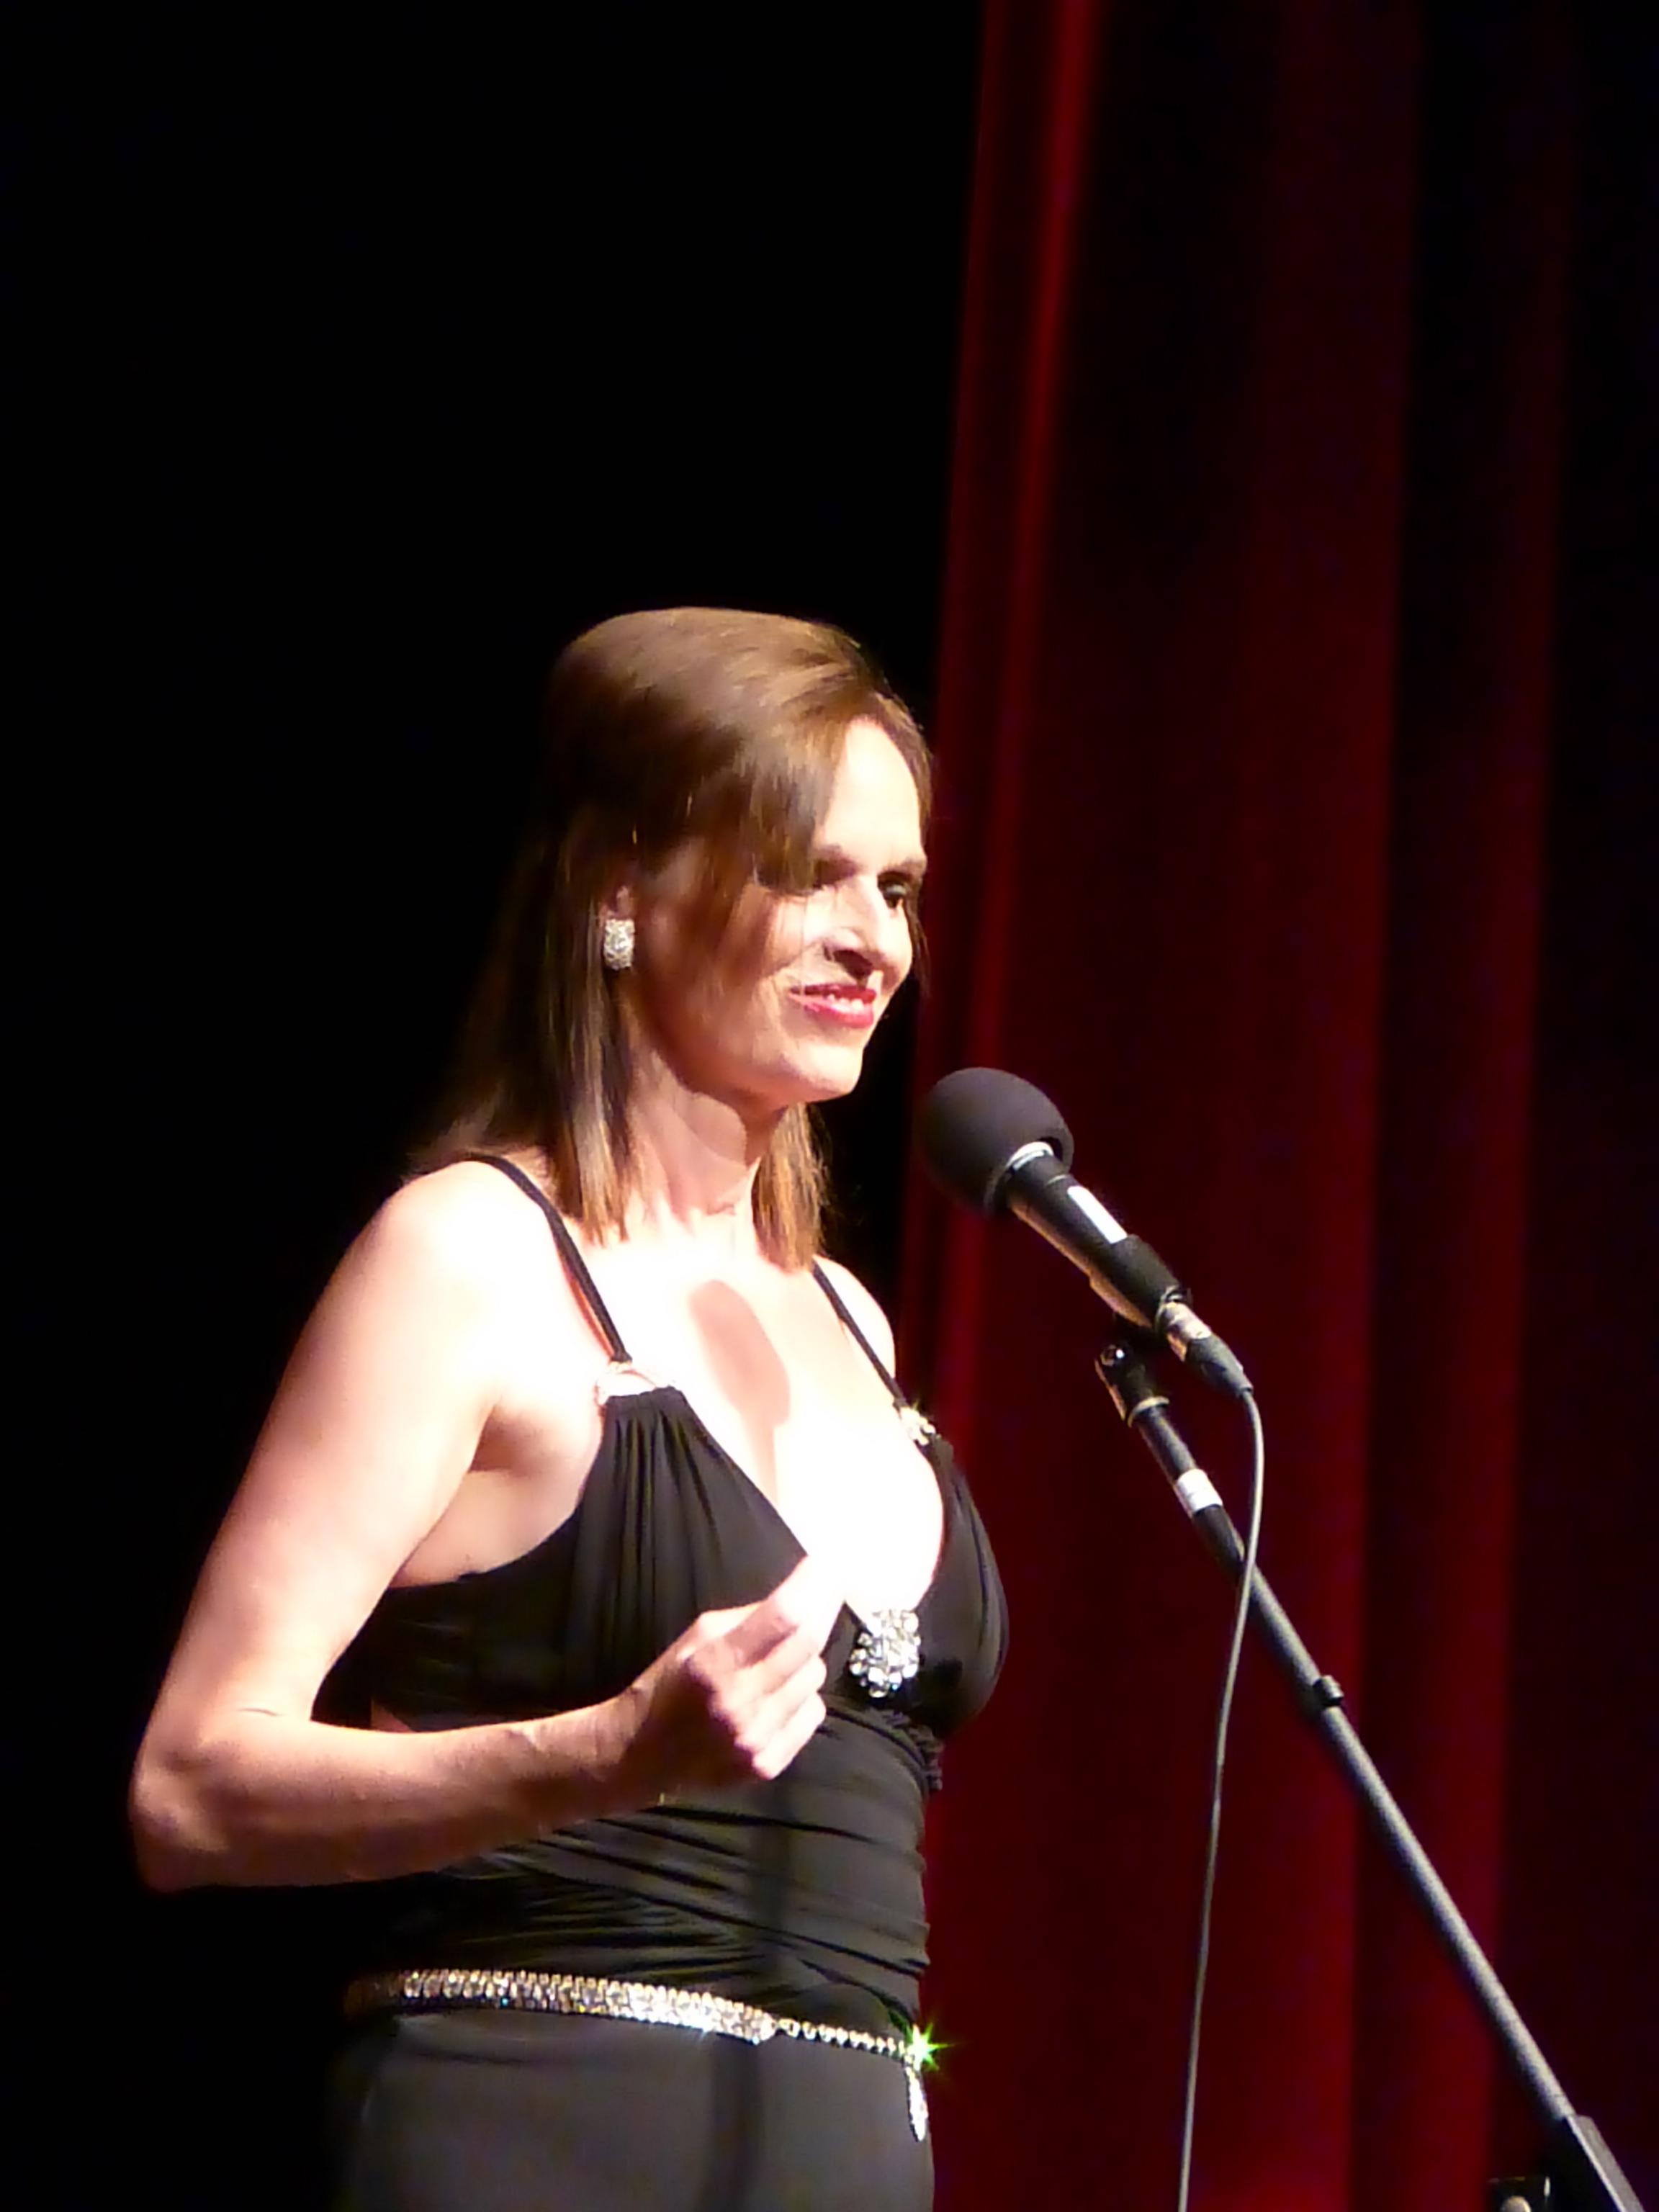 Kathy-Sparrenberger4.jpg